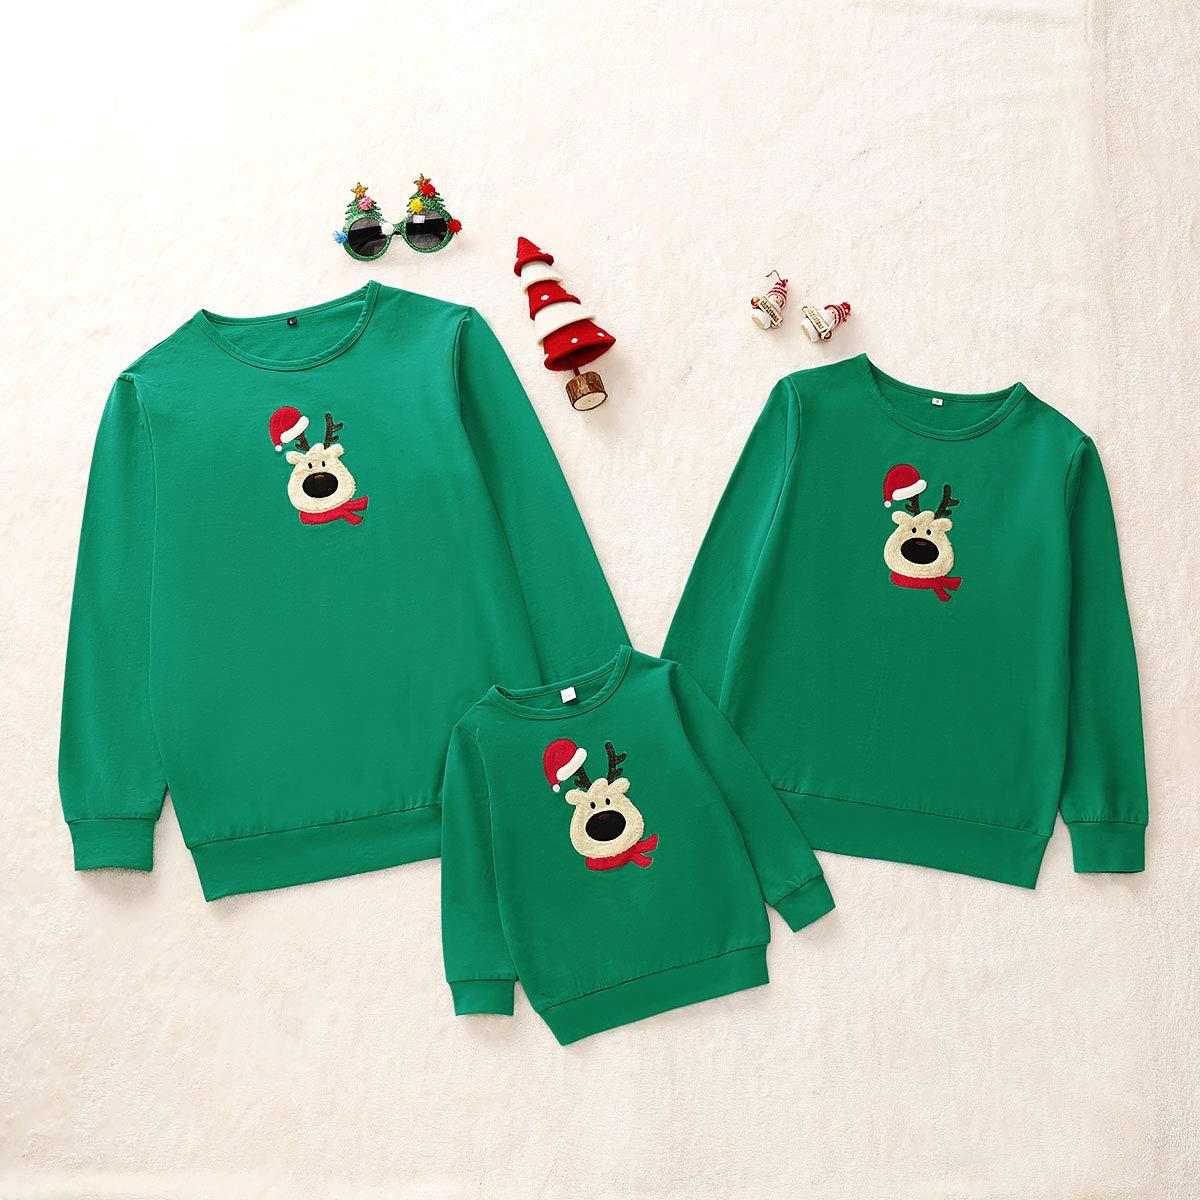 Matching Family Tees Christmas Shirts with Deer Printed Long Sleeve Tees Christmas Loungewear